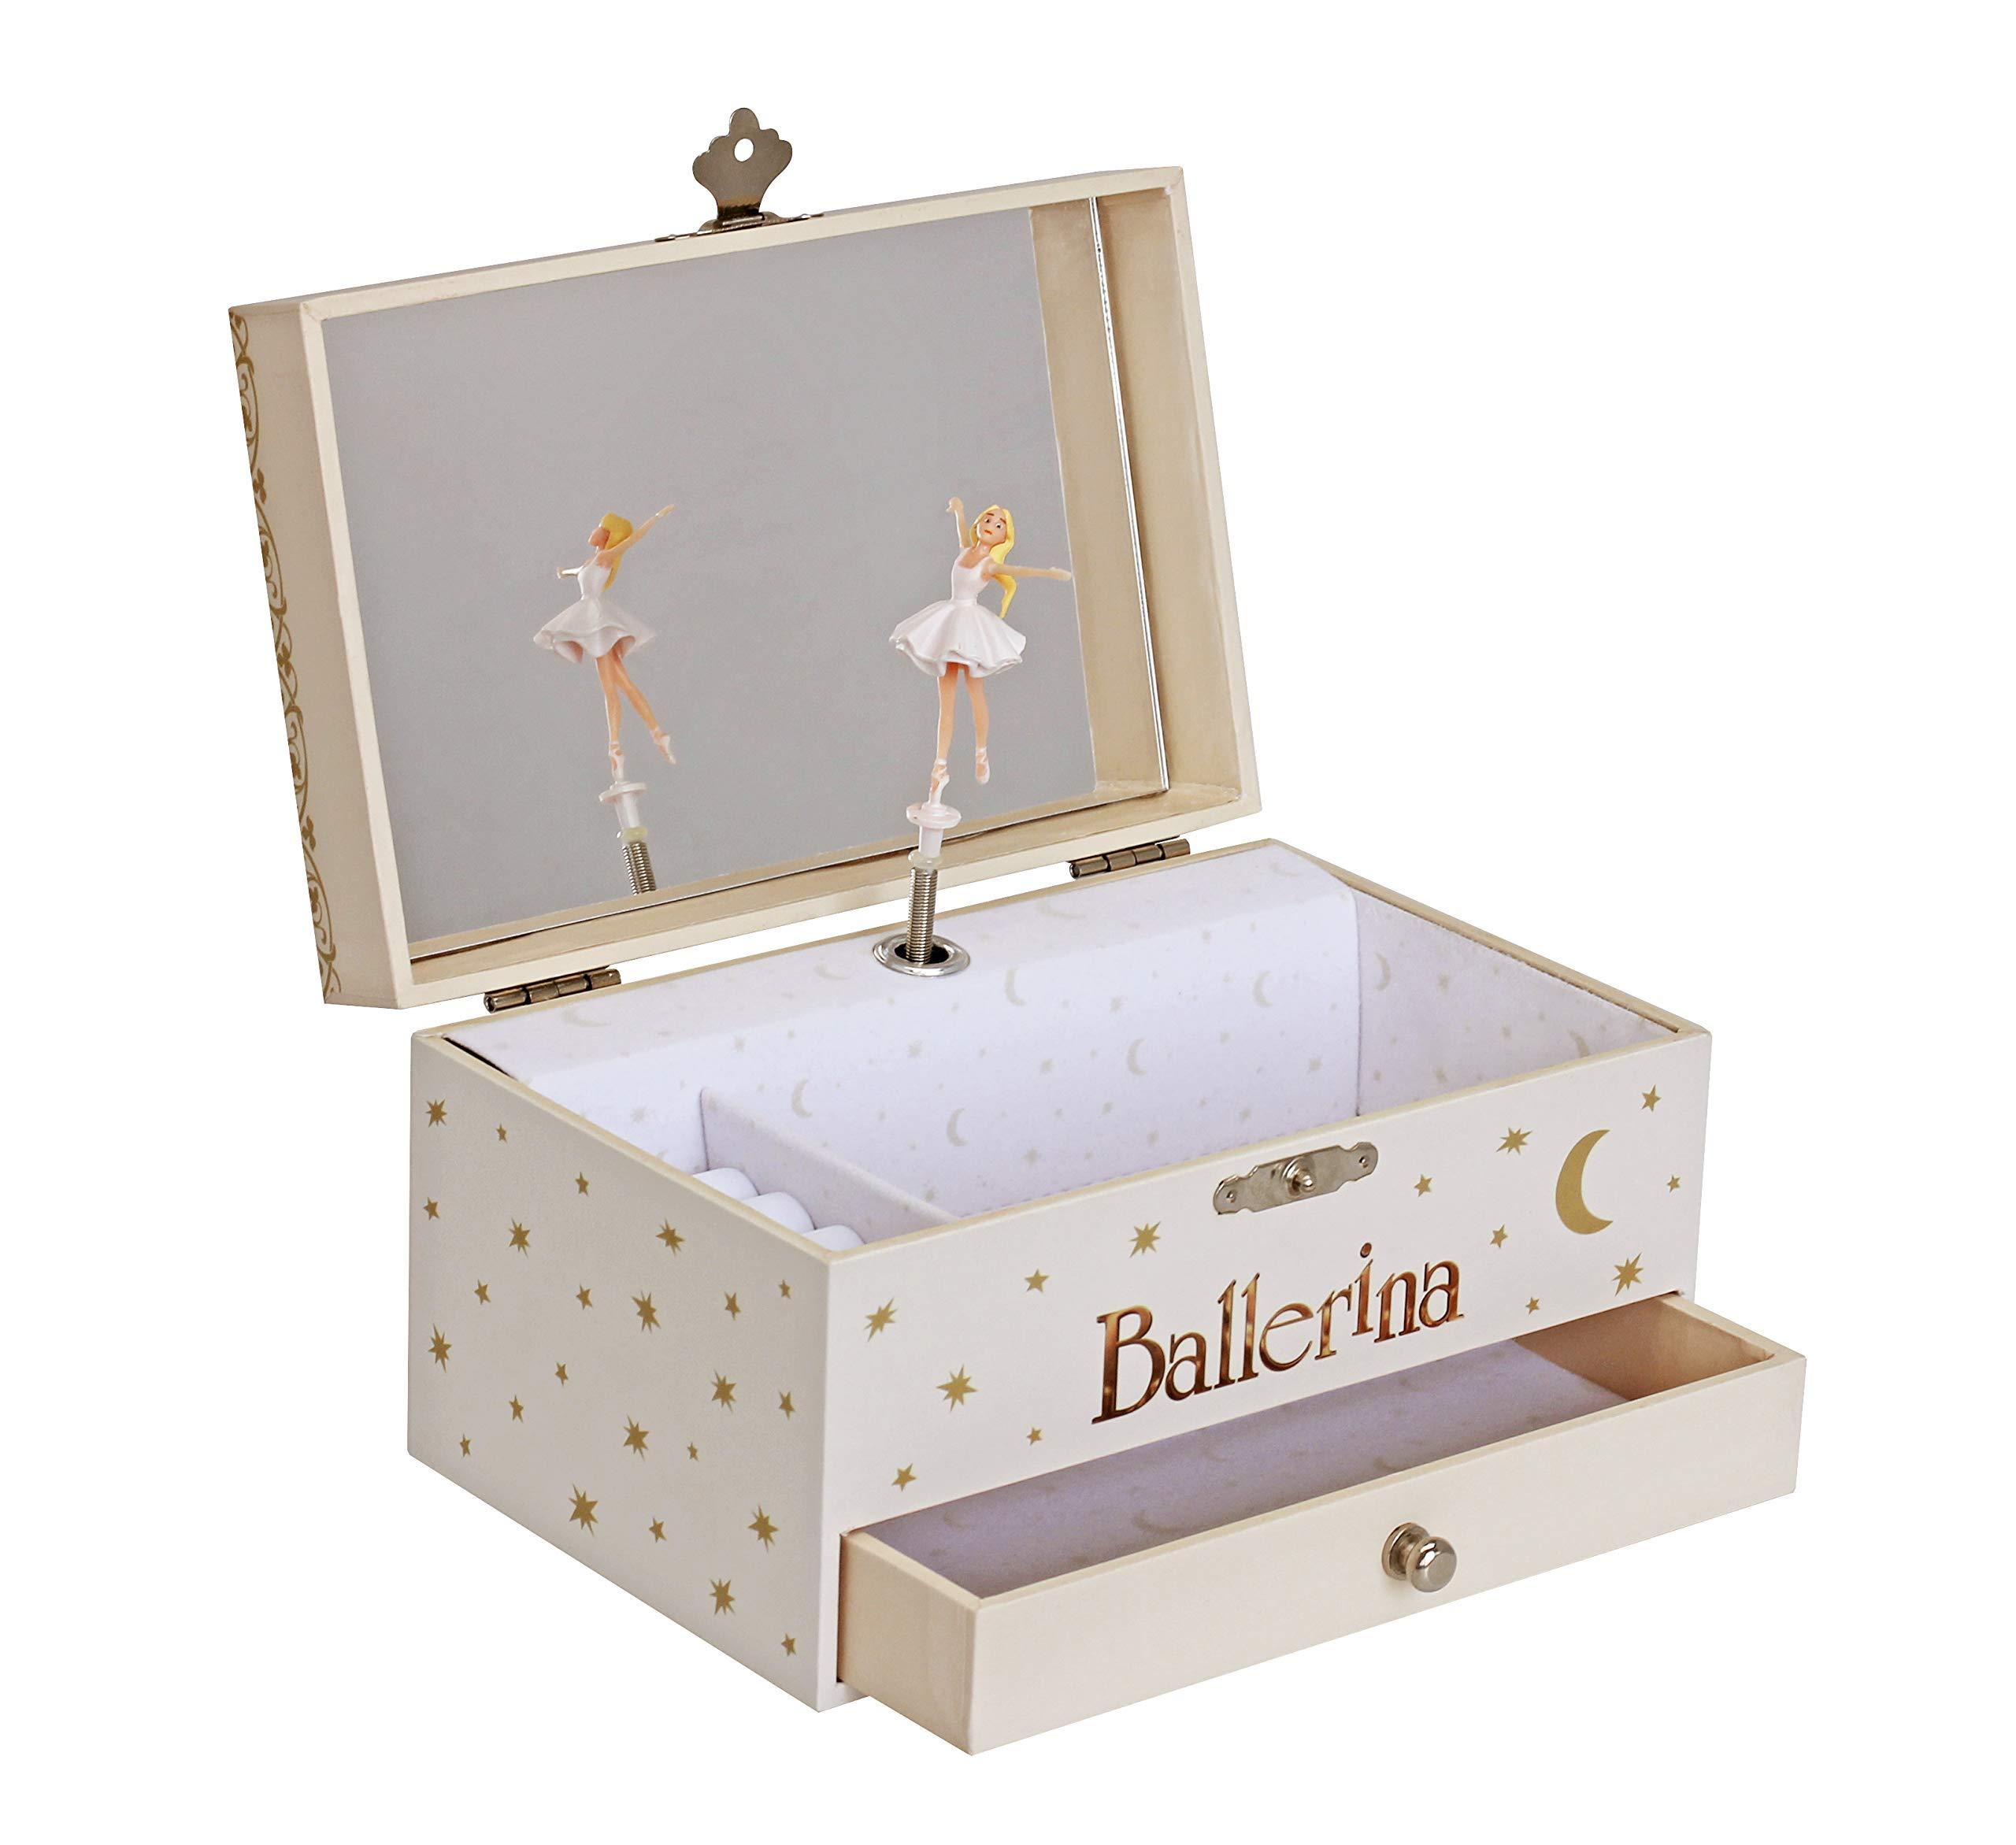 TROUSSELIER - Ballerina - Ballerina Movie - Photoluminescent Musical Jewelry Box - Glow in the Dark